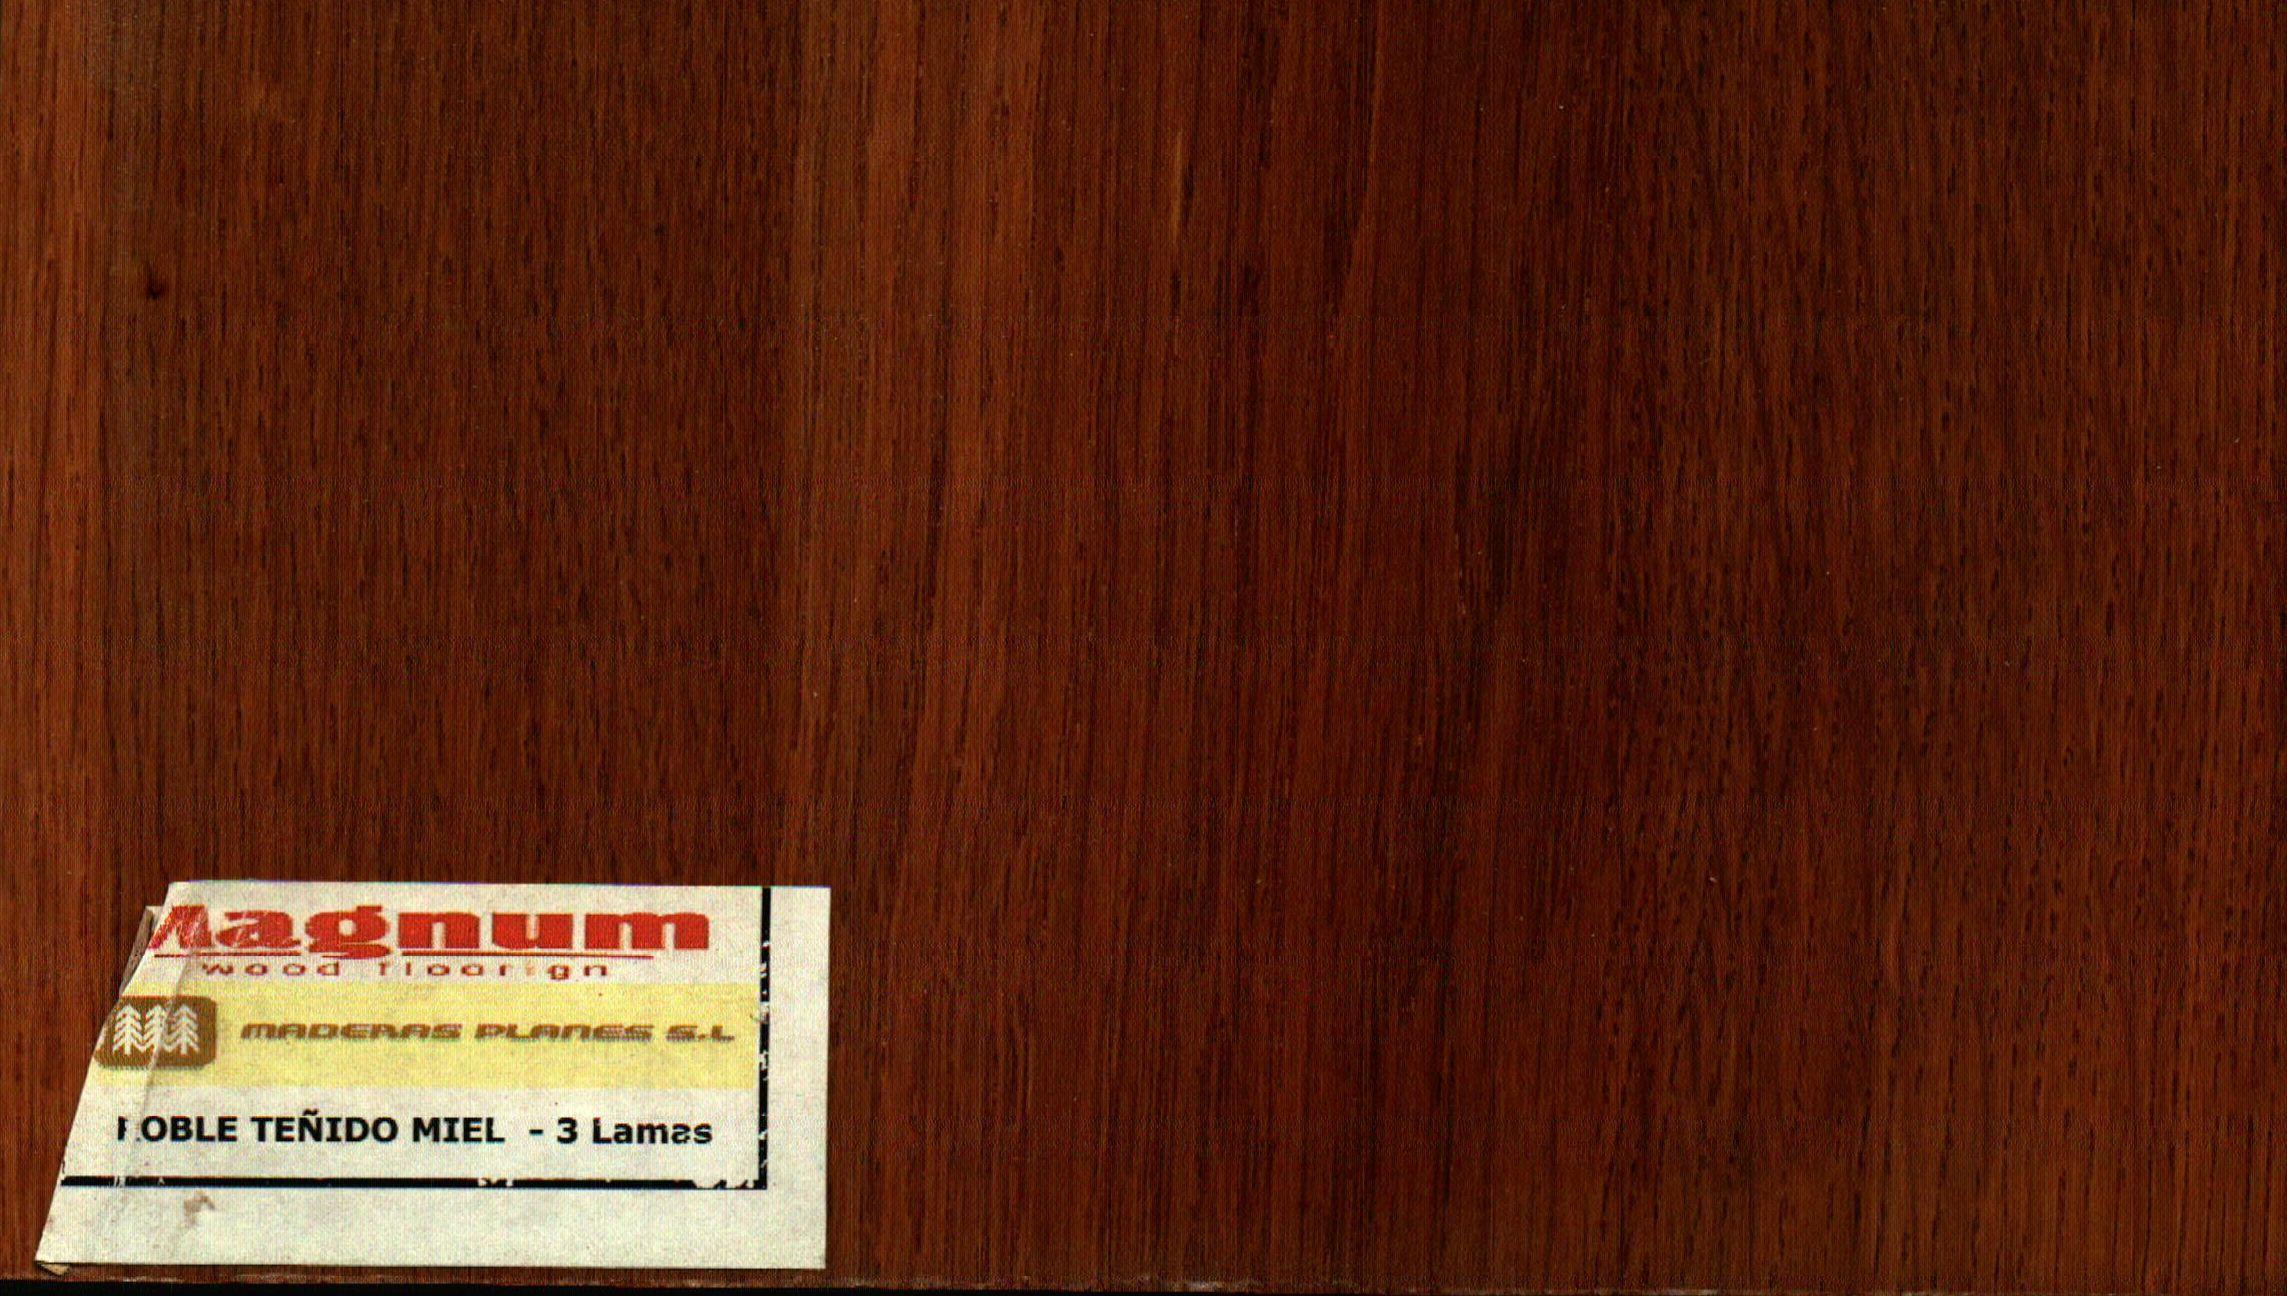 madera para parquet carpintería mena